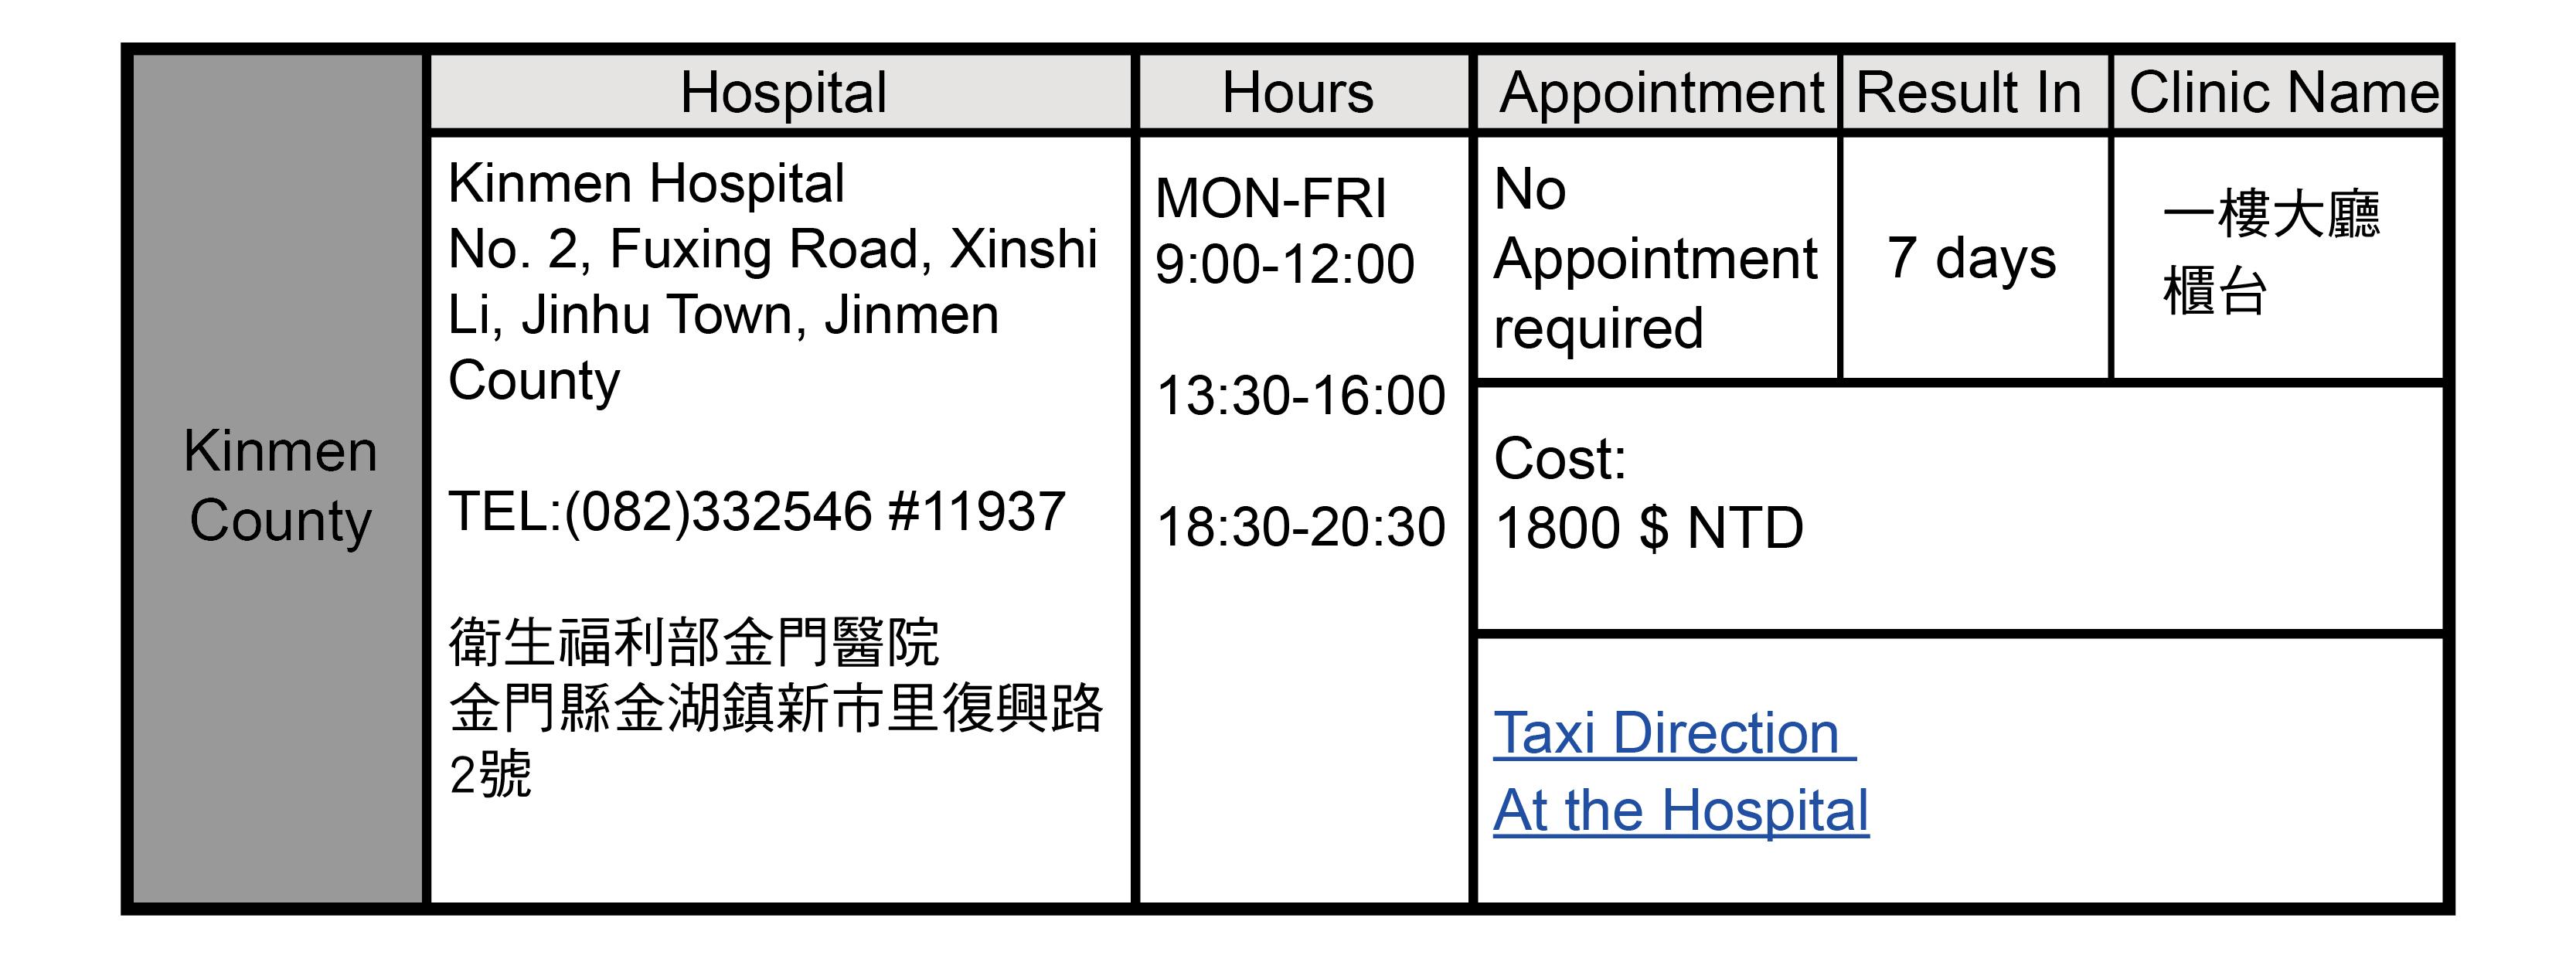 Kinmen County, Taiwan Health Check Hospitals Addresses